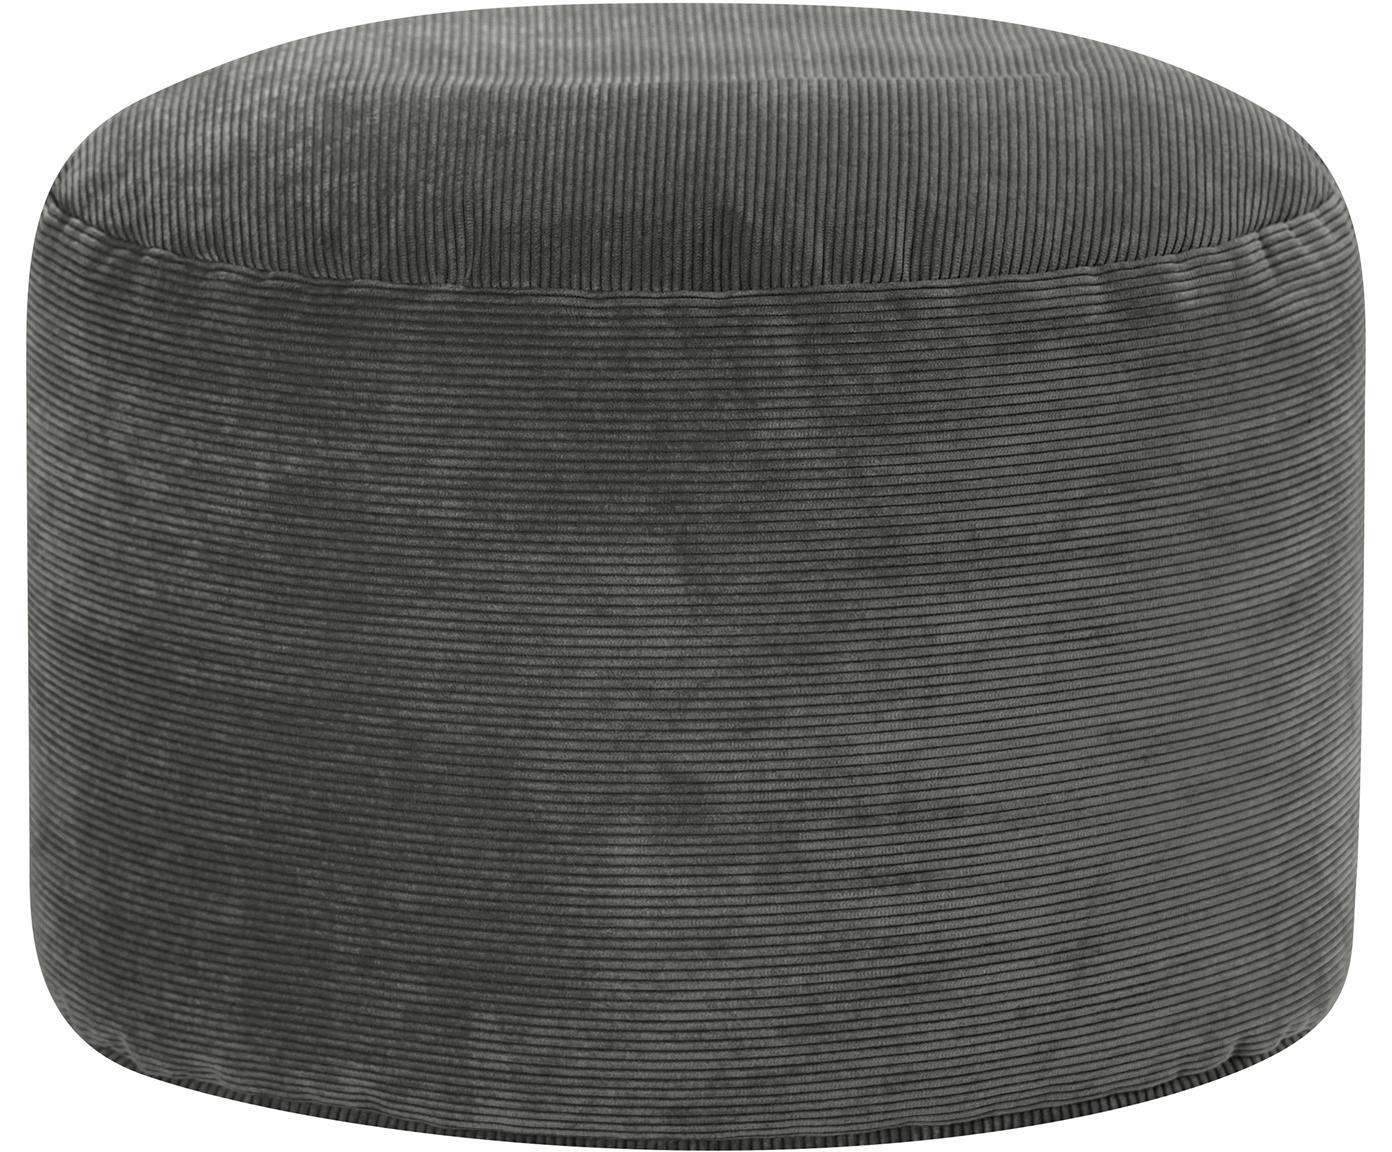 Cord-Pouf Cordone, Bezug: Cord (96% Polyester, 4% P, Anthrazit, Ø 50 x H 30 cm